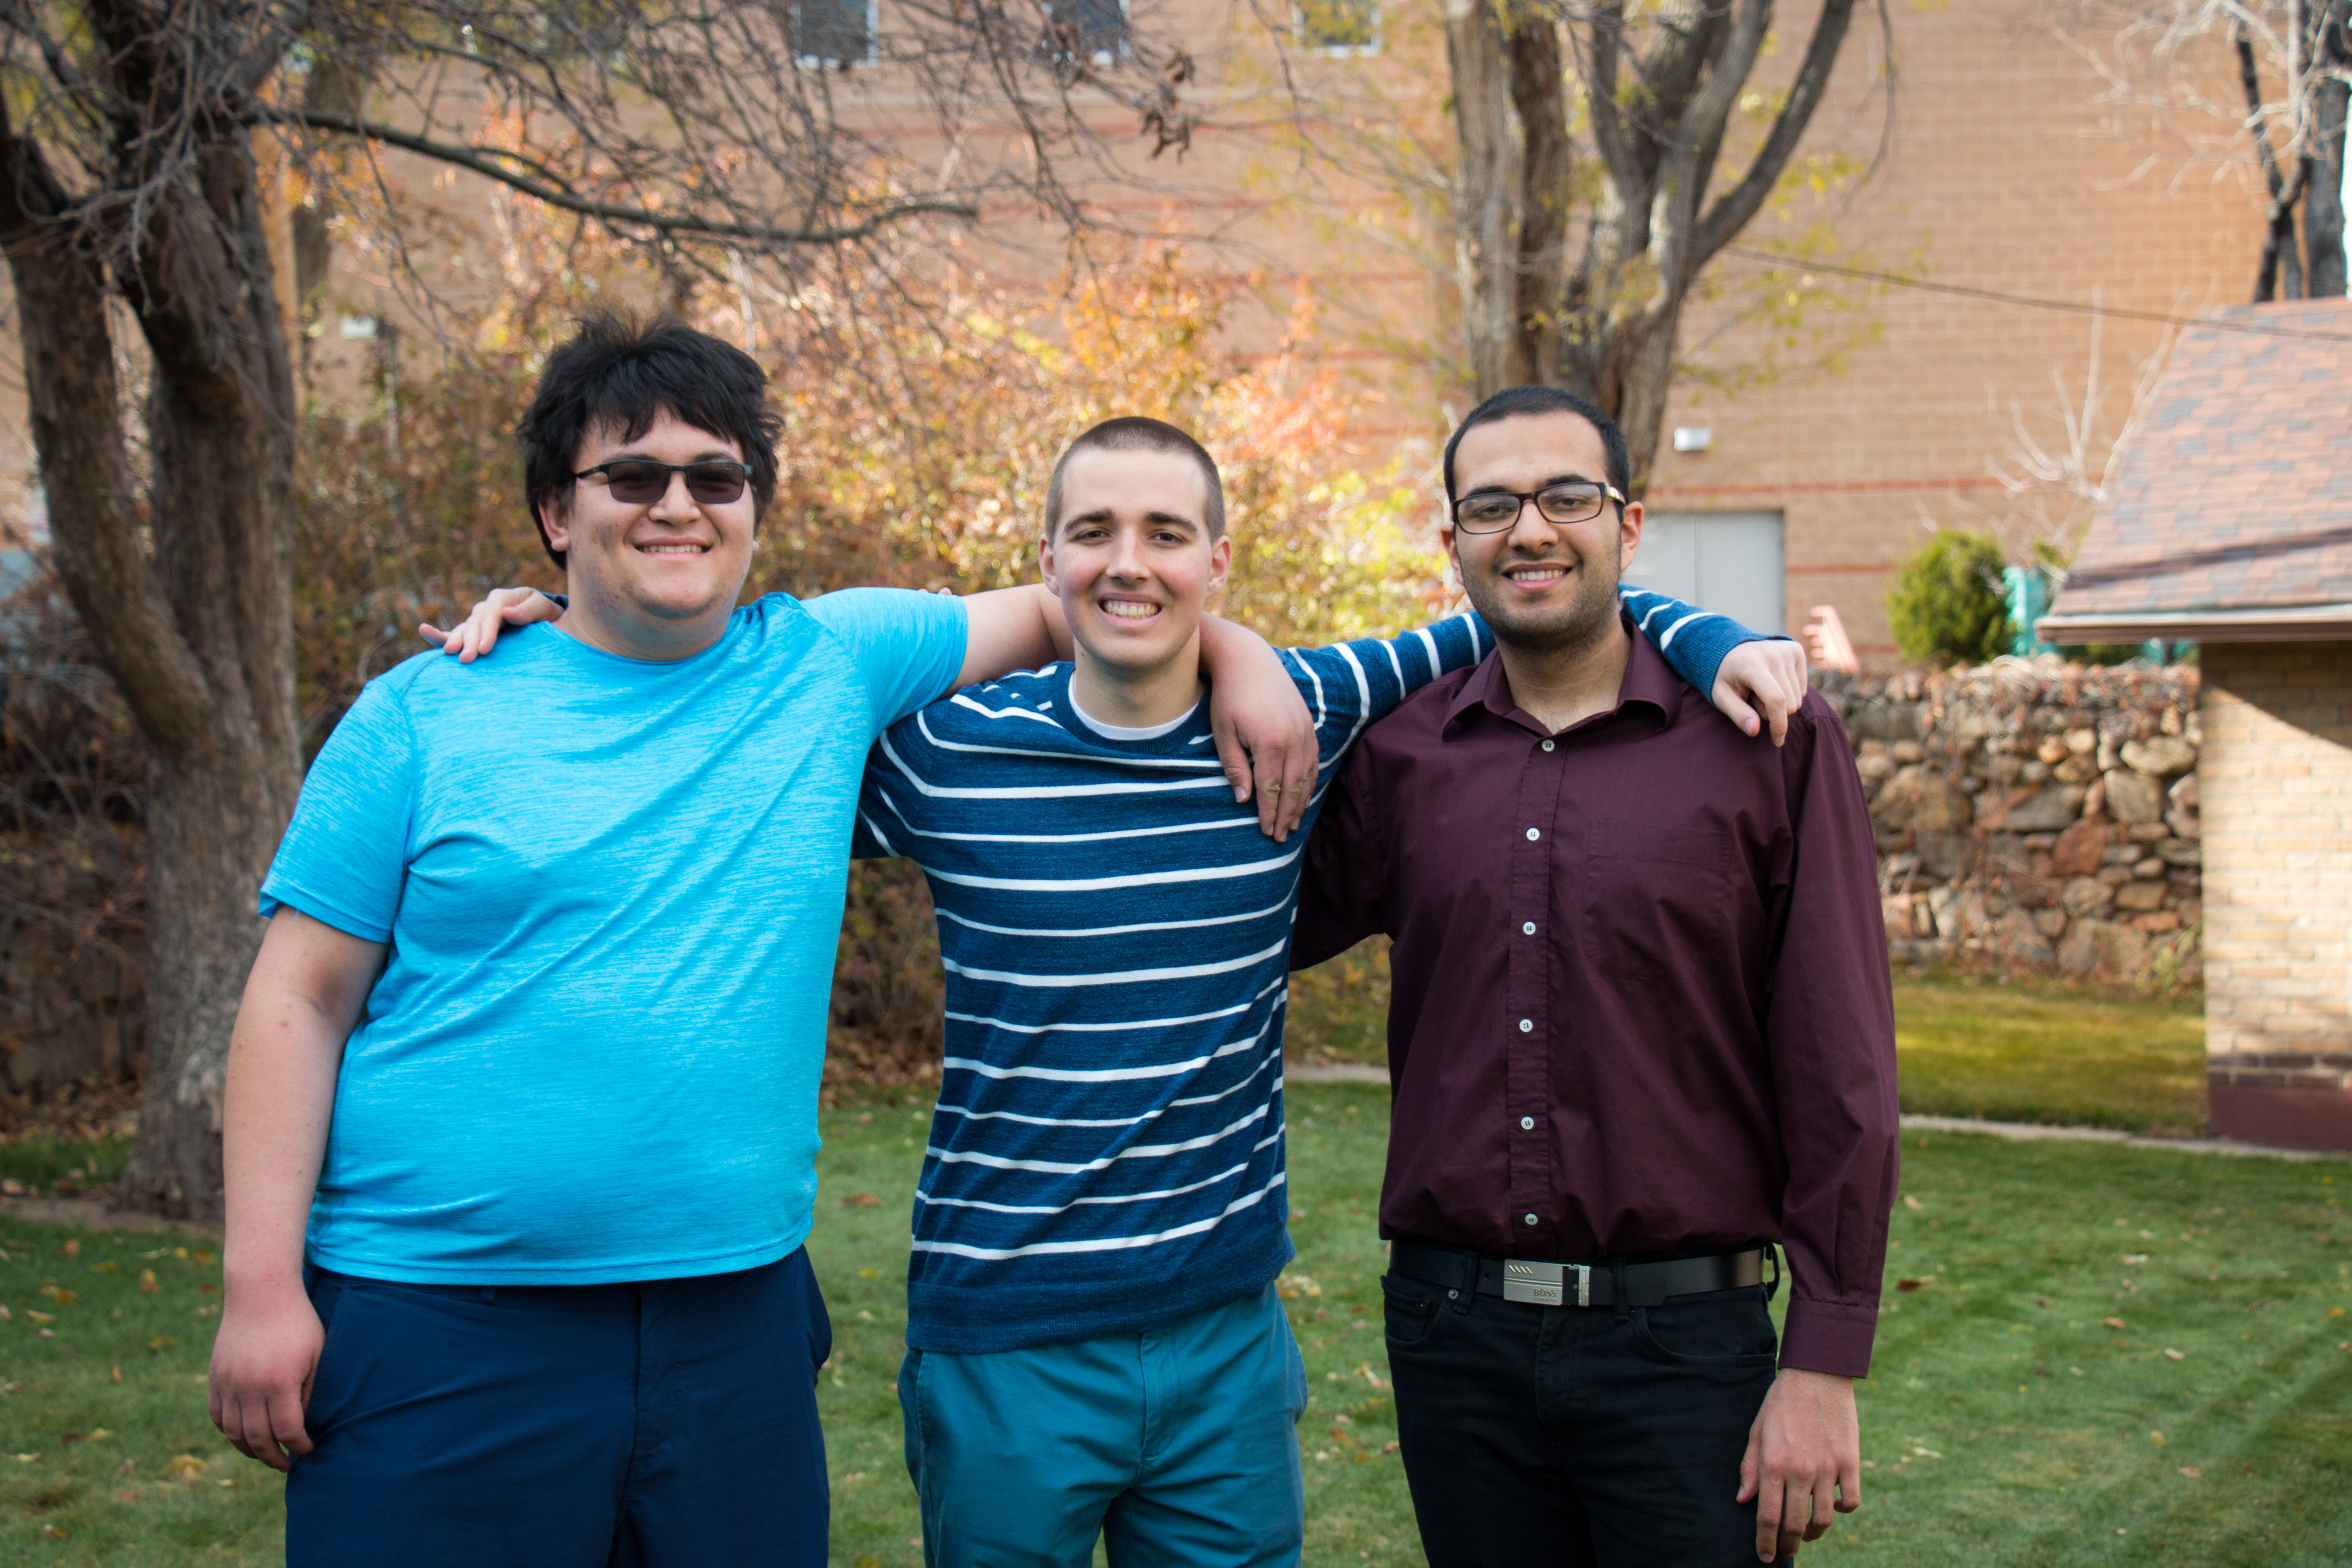 Sam Reinehr, Matt Baldin and Allee Zarrini of the SAMurai MAsters